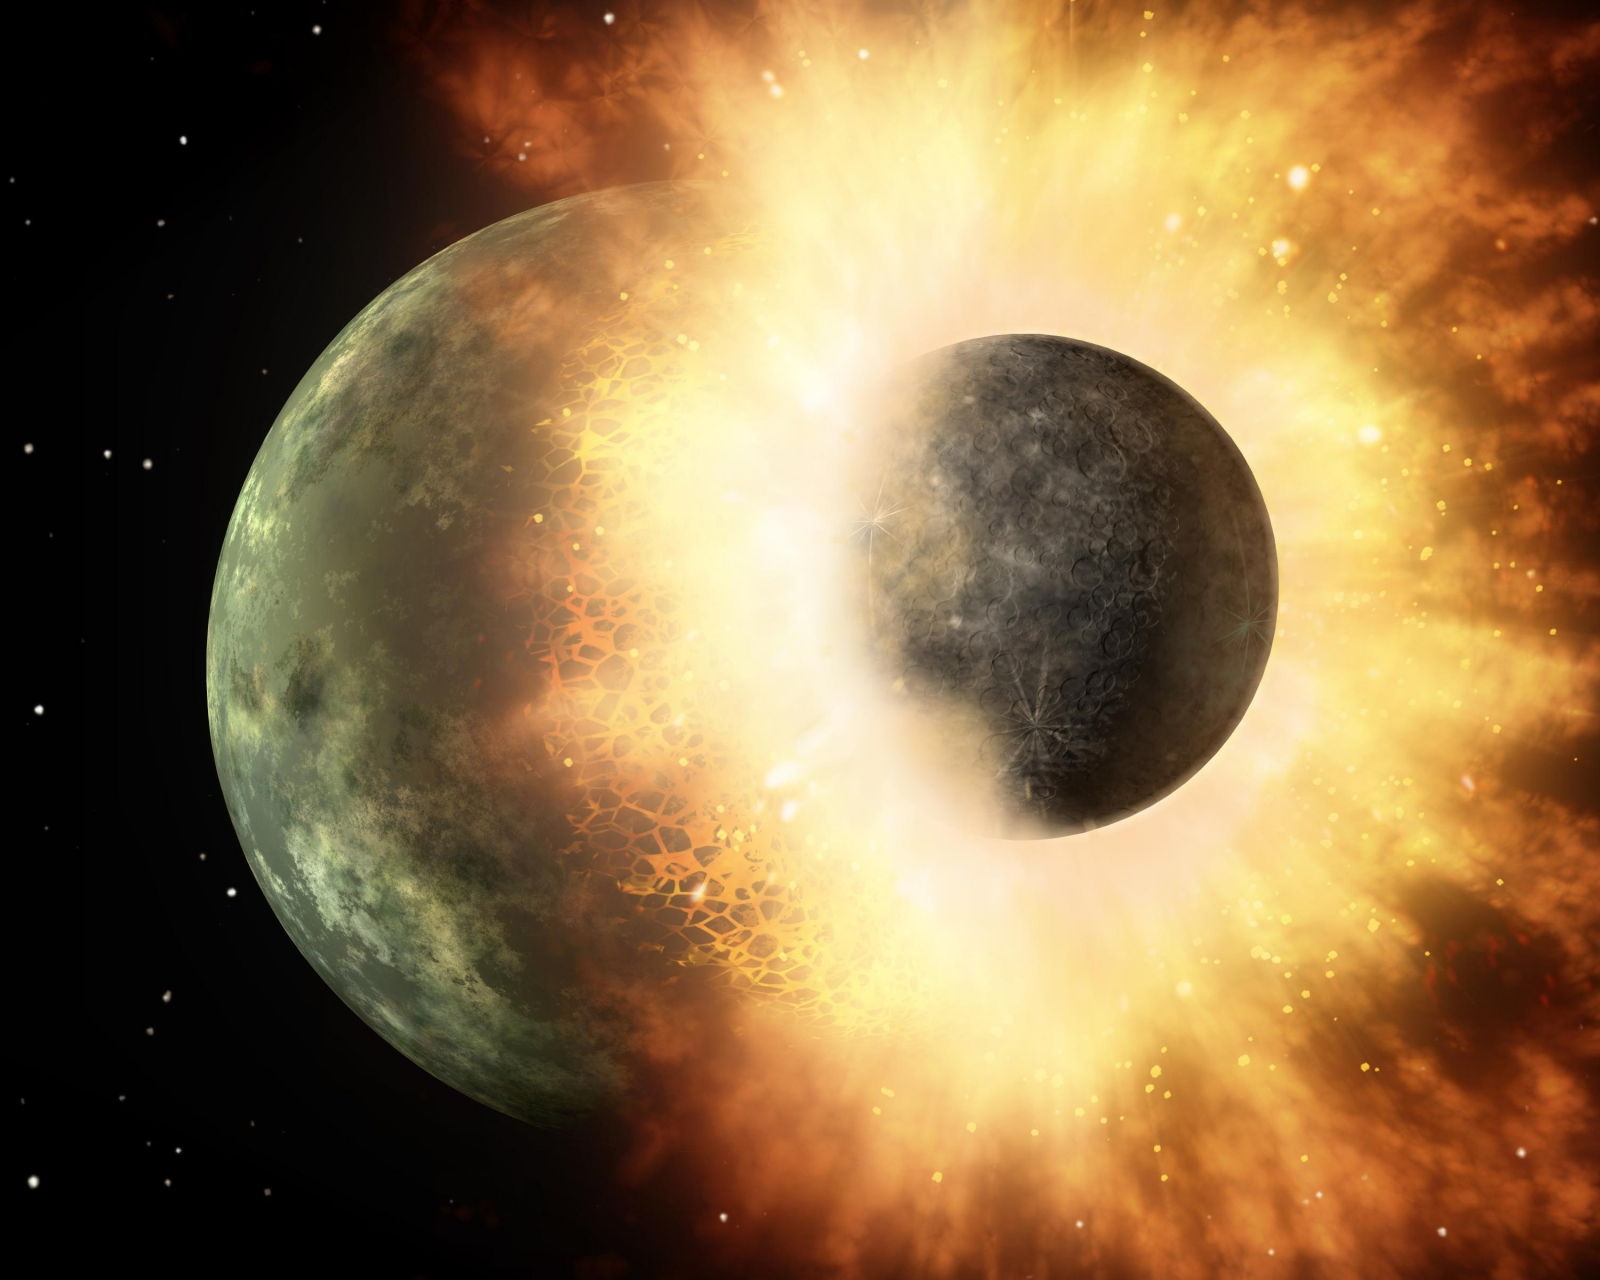 moon-forming impact